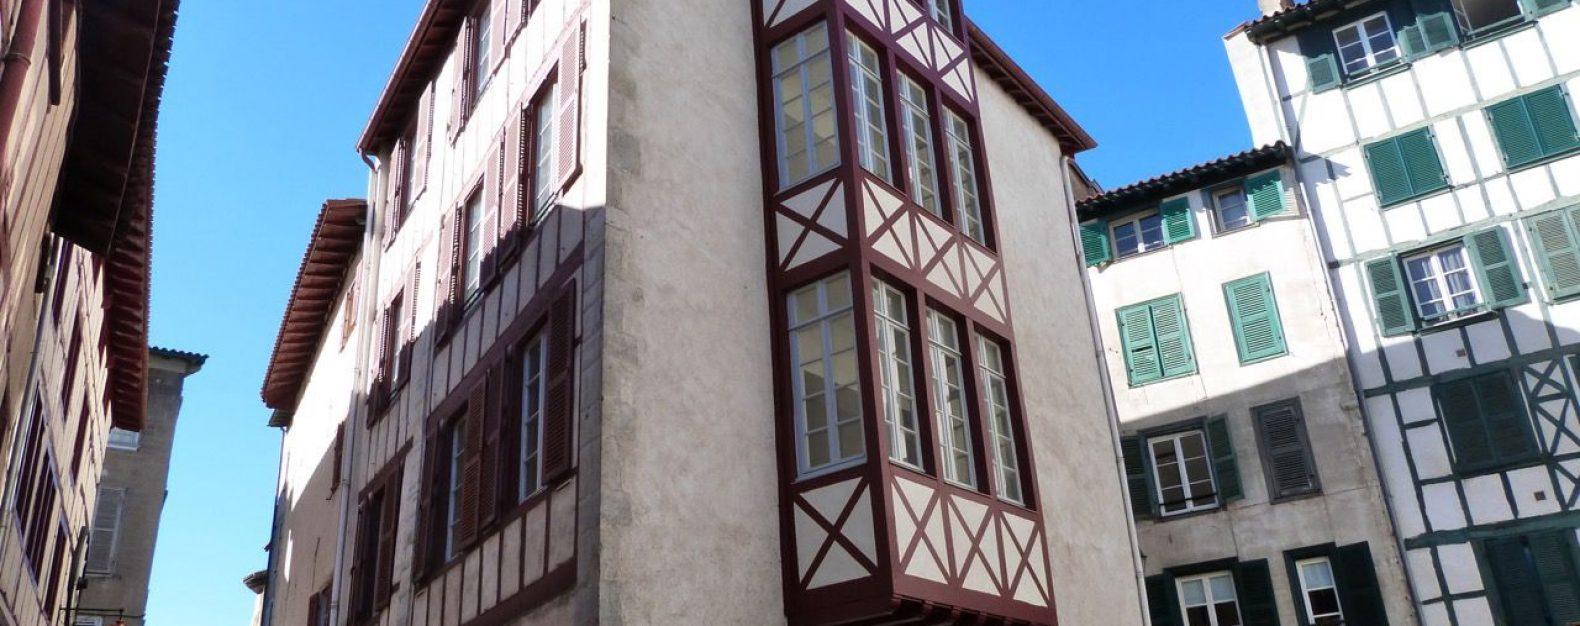 3 Rue Douer à Bayonne